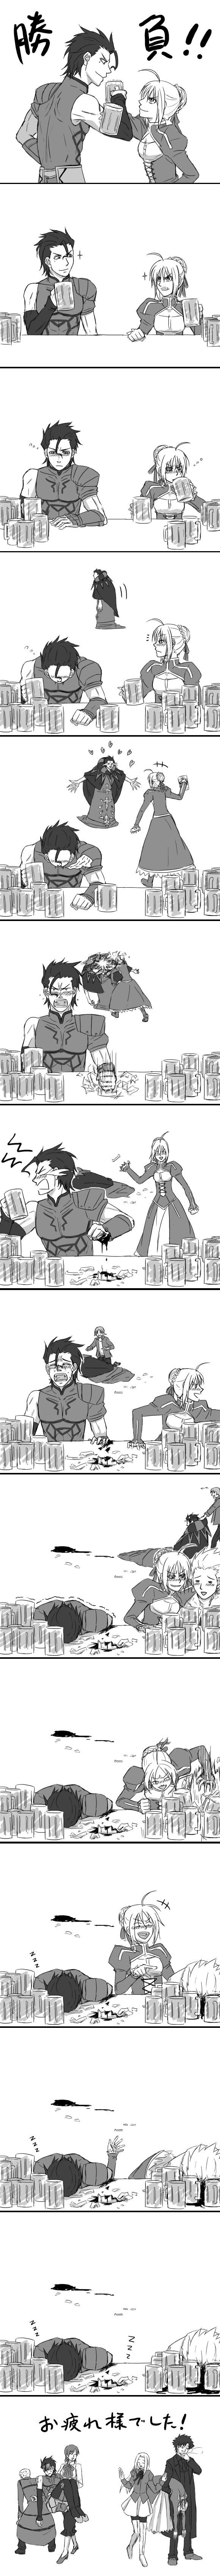 Tags: Anime, Pixiv Id 843854, Fate/zero, Caster (Fate/zero), Gilgamesh, Lancer (Fate/zero), Emiya Kiritsugu, Uryuu Ryuunosuke, Saber (Fate/stay night), Sola-Ui Nuada-Re Sophia-Ri, Kayneth Archibald El-Melloi, Irisviel von Einzbern, Frustrated